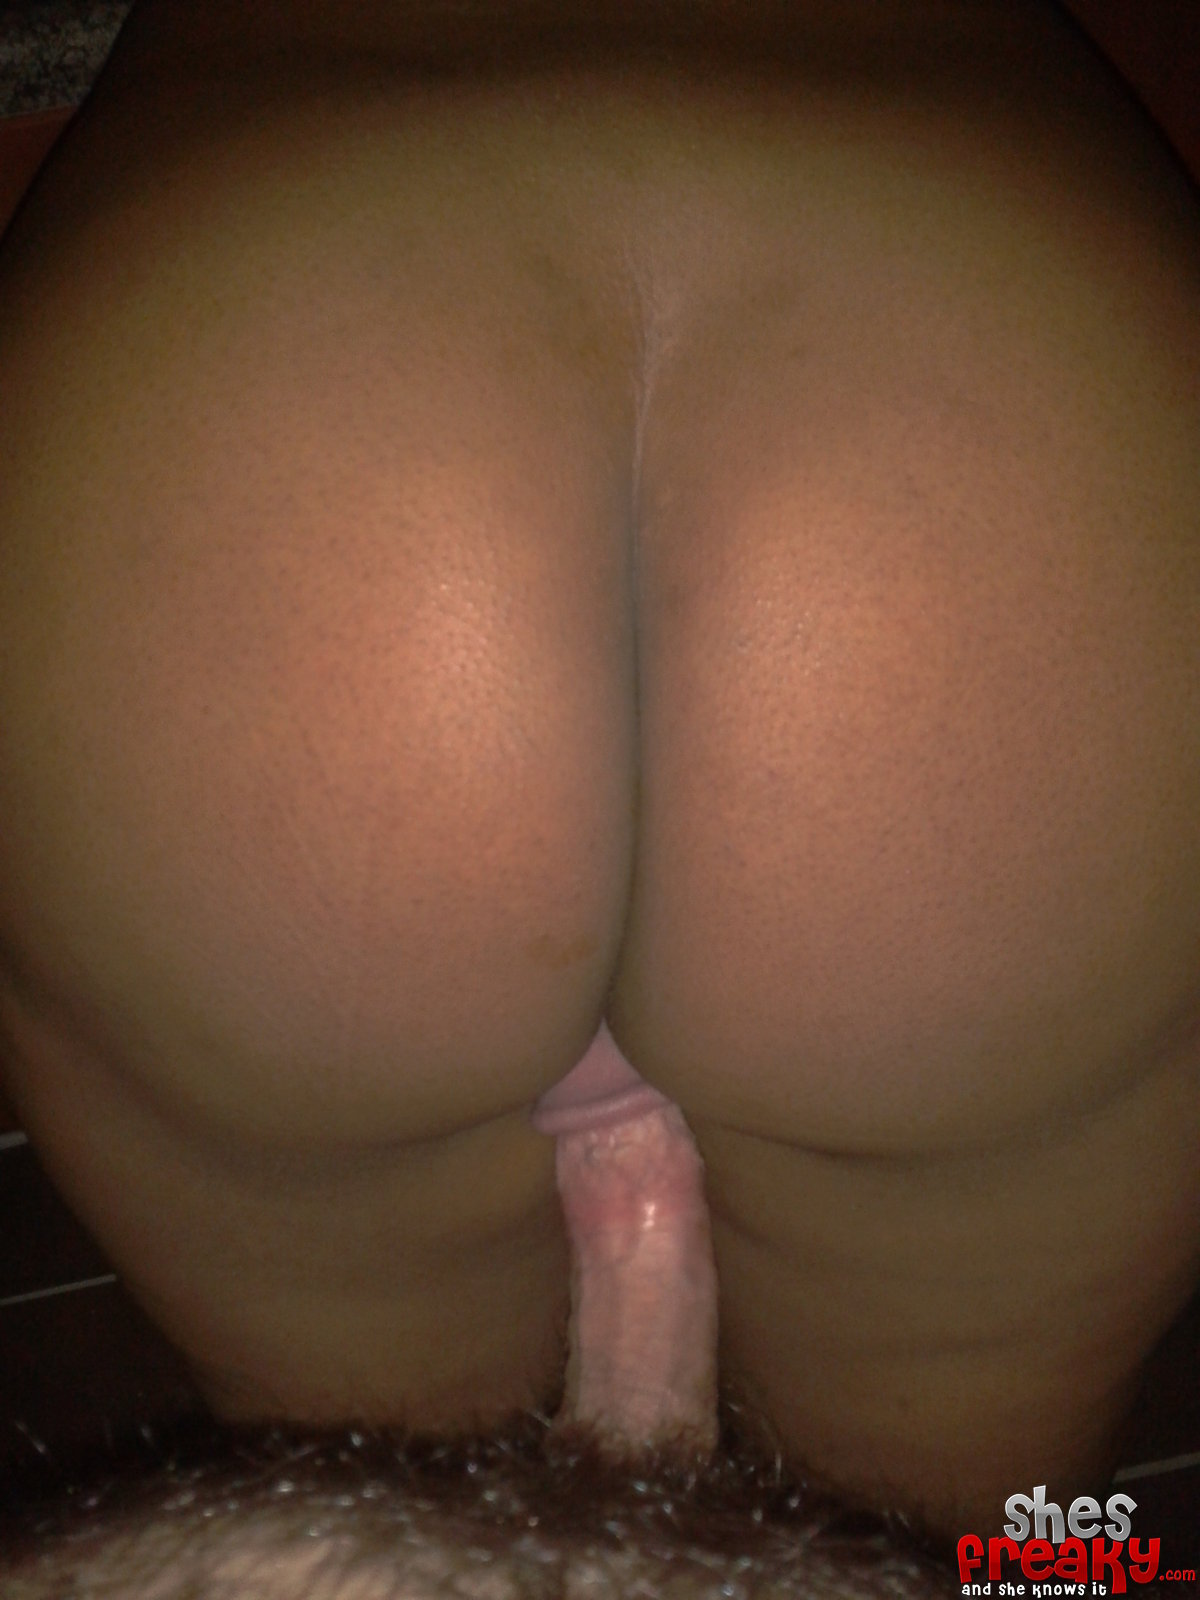 Pimps who spank their girls